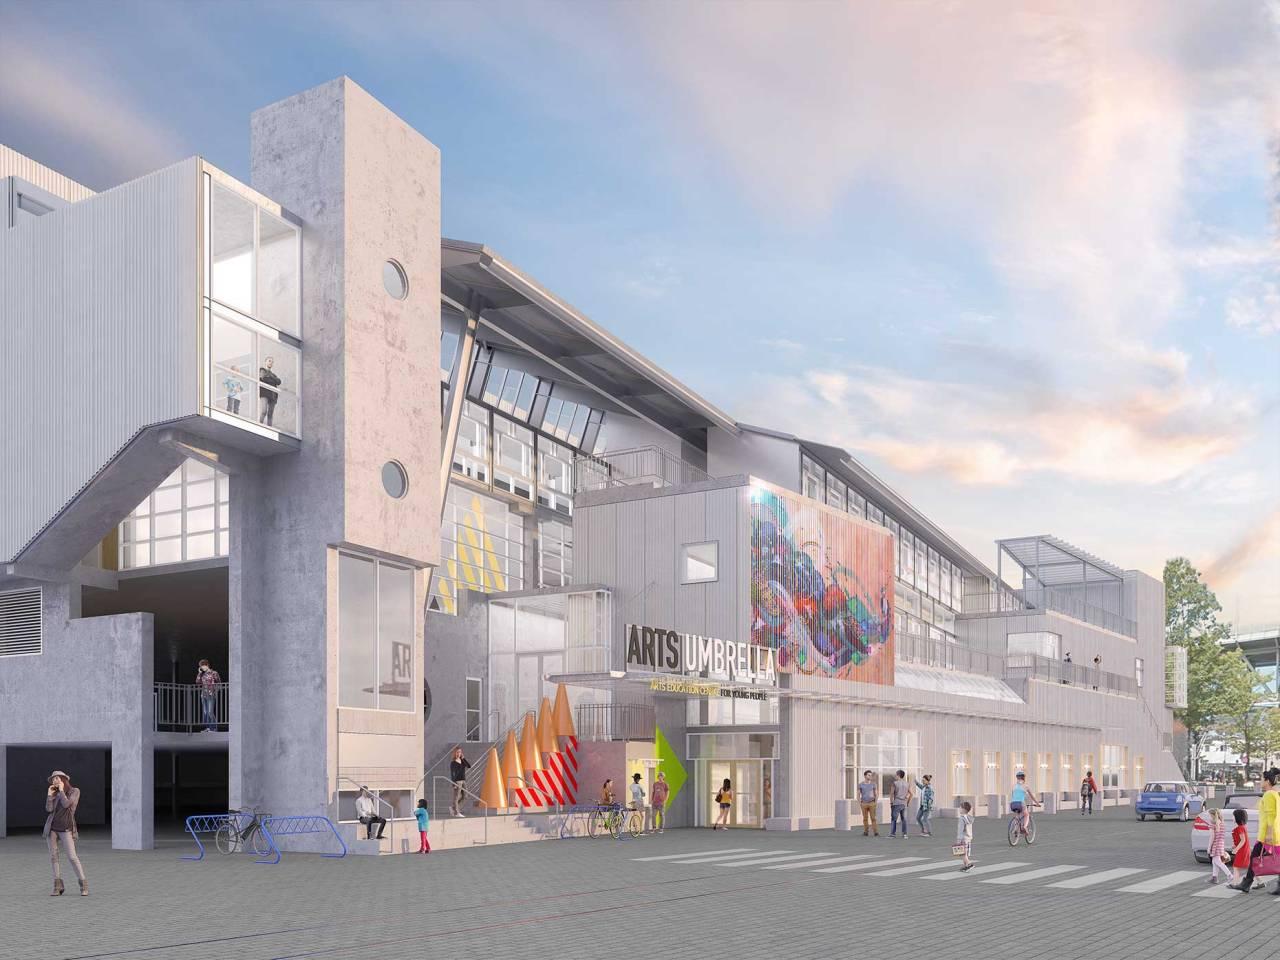 Arts-Umbrella-The-New-Limitless-New-Building-3.jpg